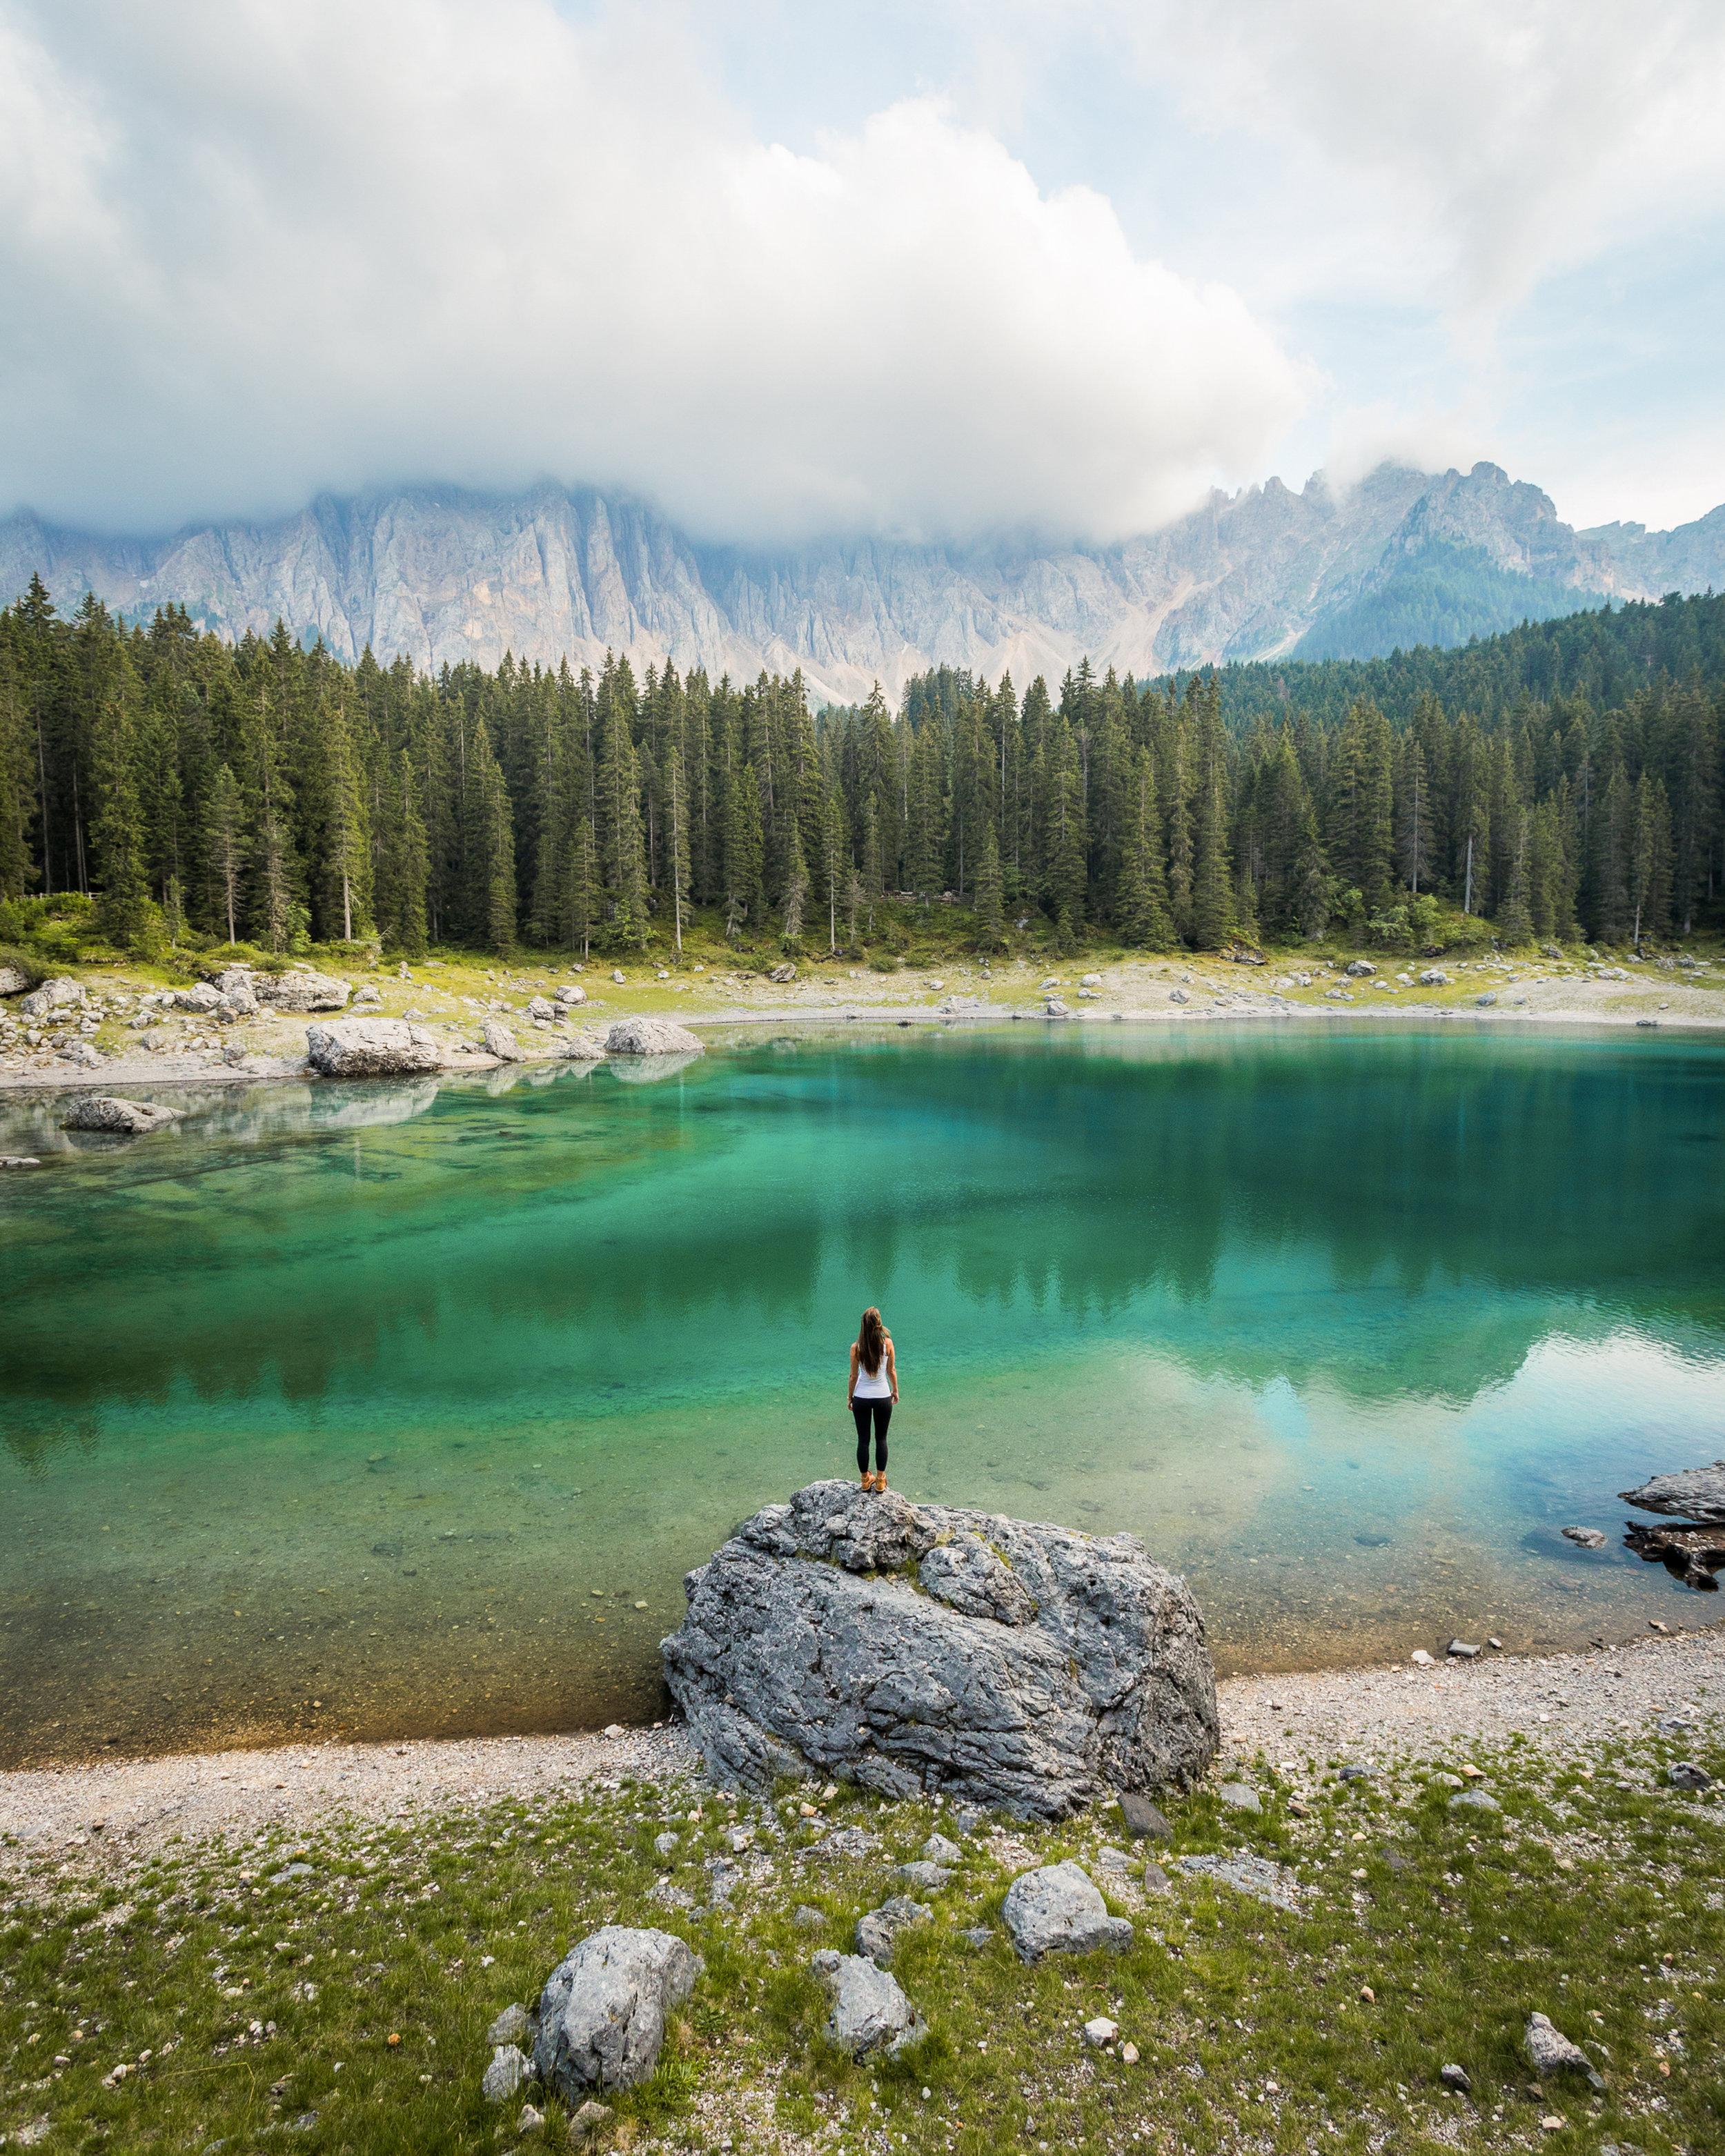 Andrea in the Dolomites by Michael Matti-50.jpg